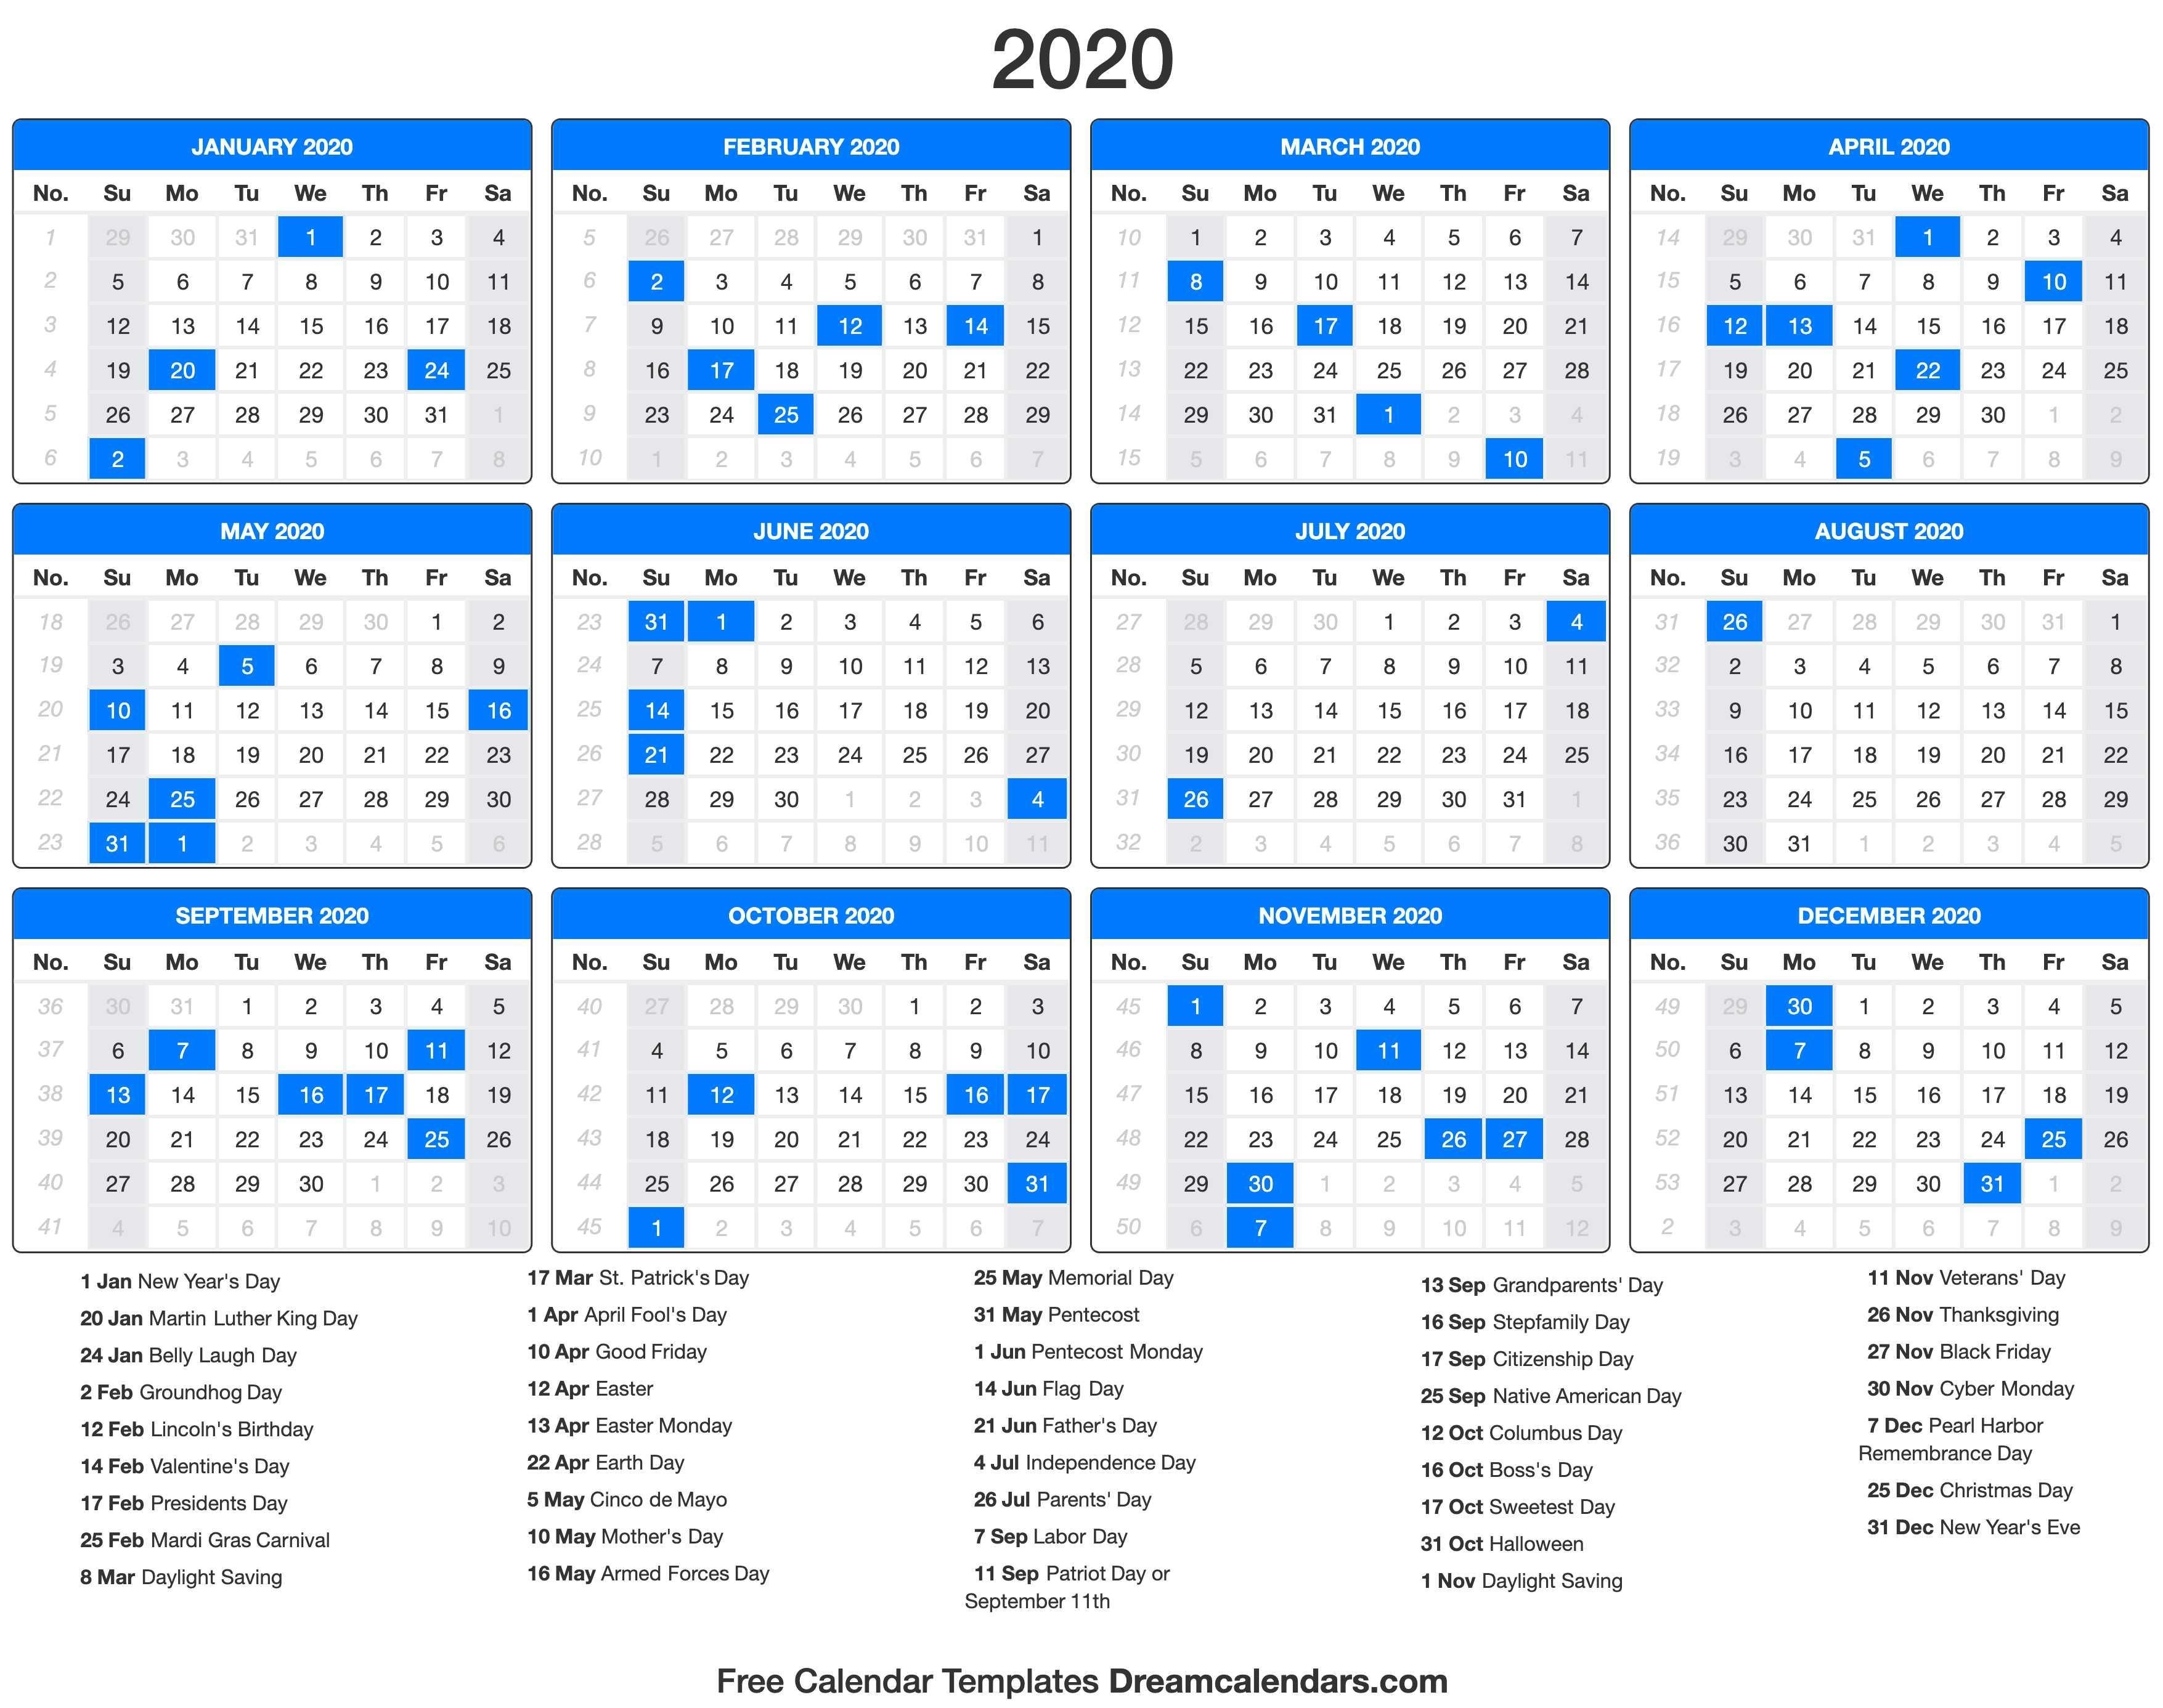 Dream Calendars - Make Your Calendar Template Blog-2020 Calendar Printable Major Jewish Holidays